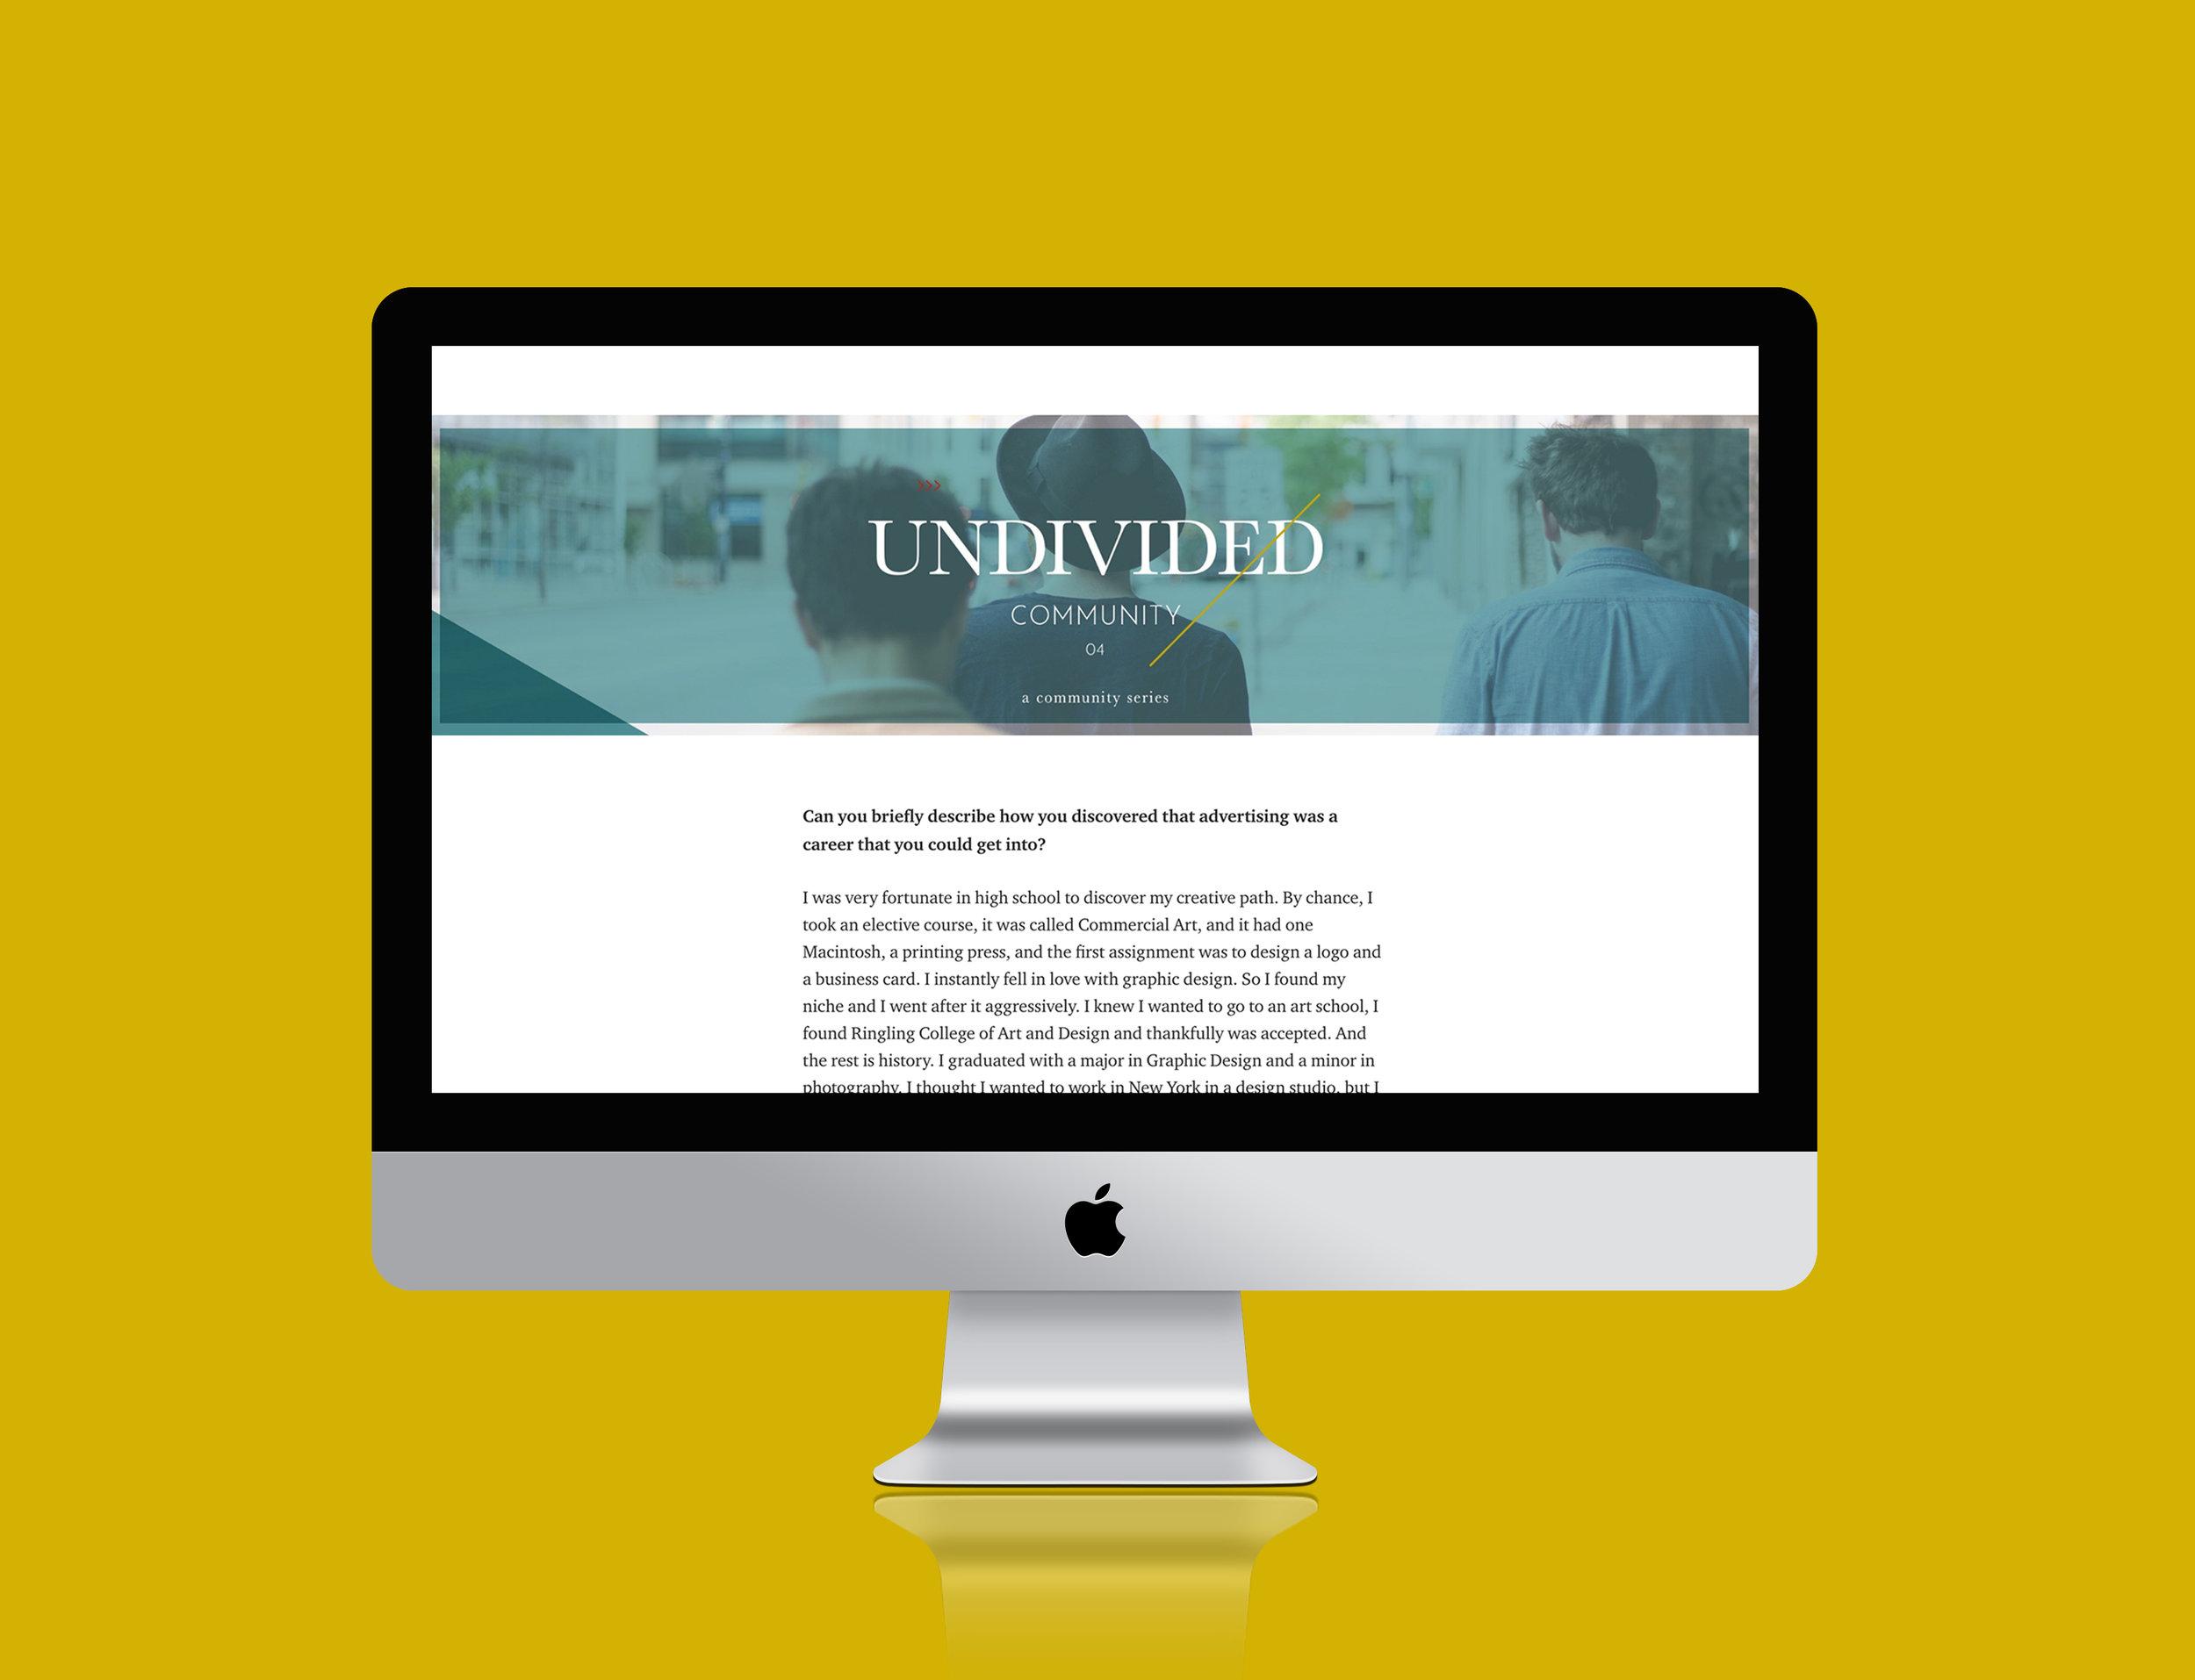 Undivided-Community1.jpg